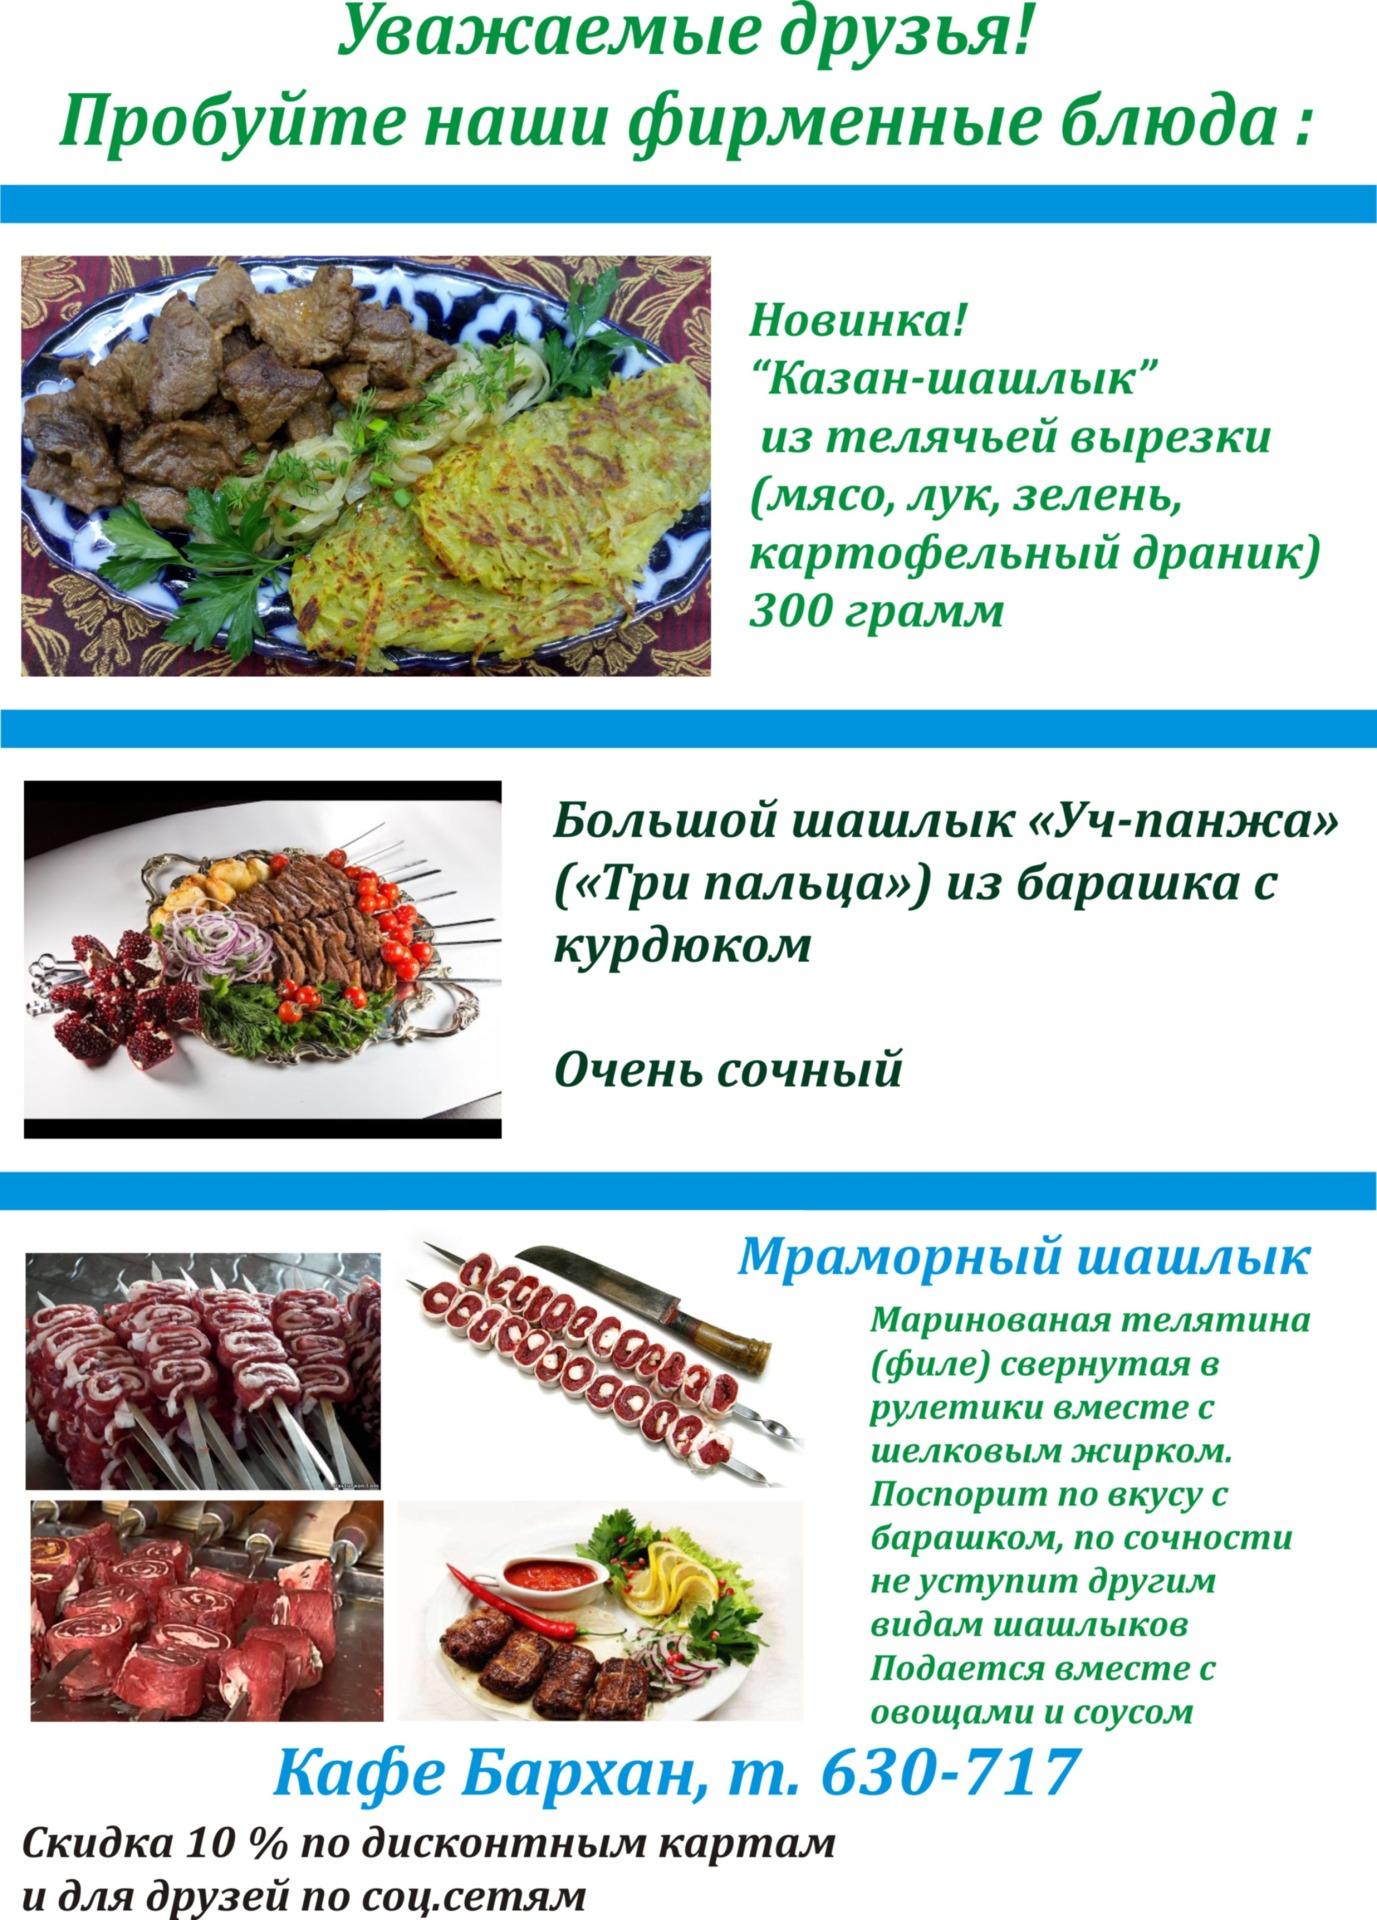 шашлык, мясо, гриль